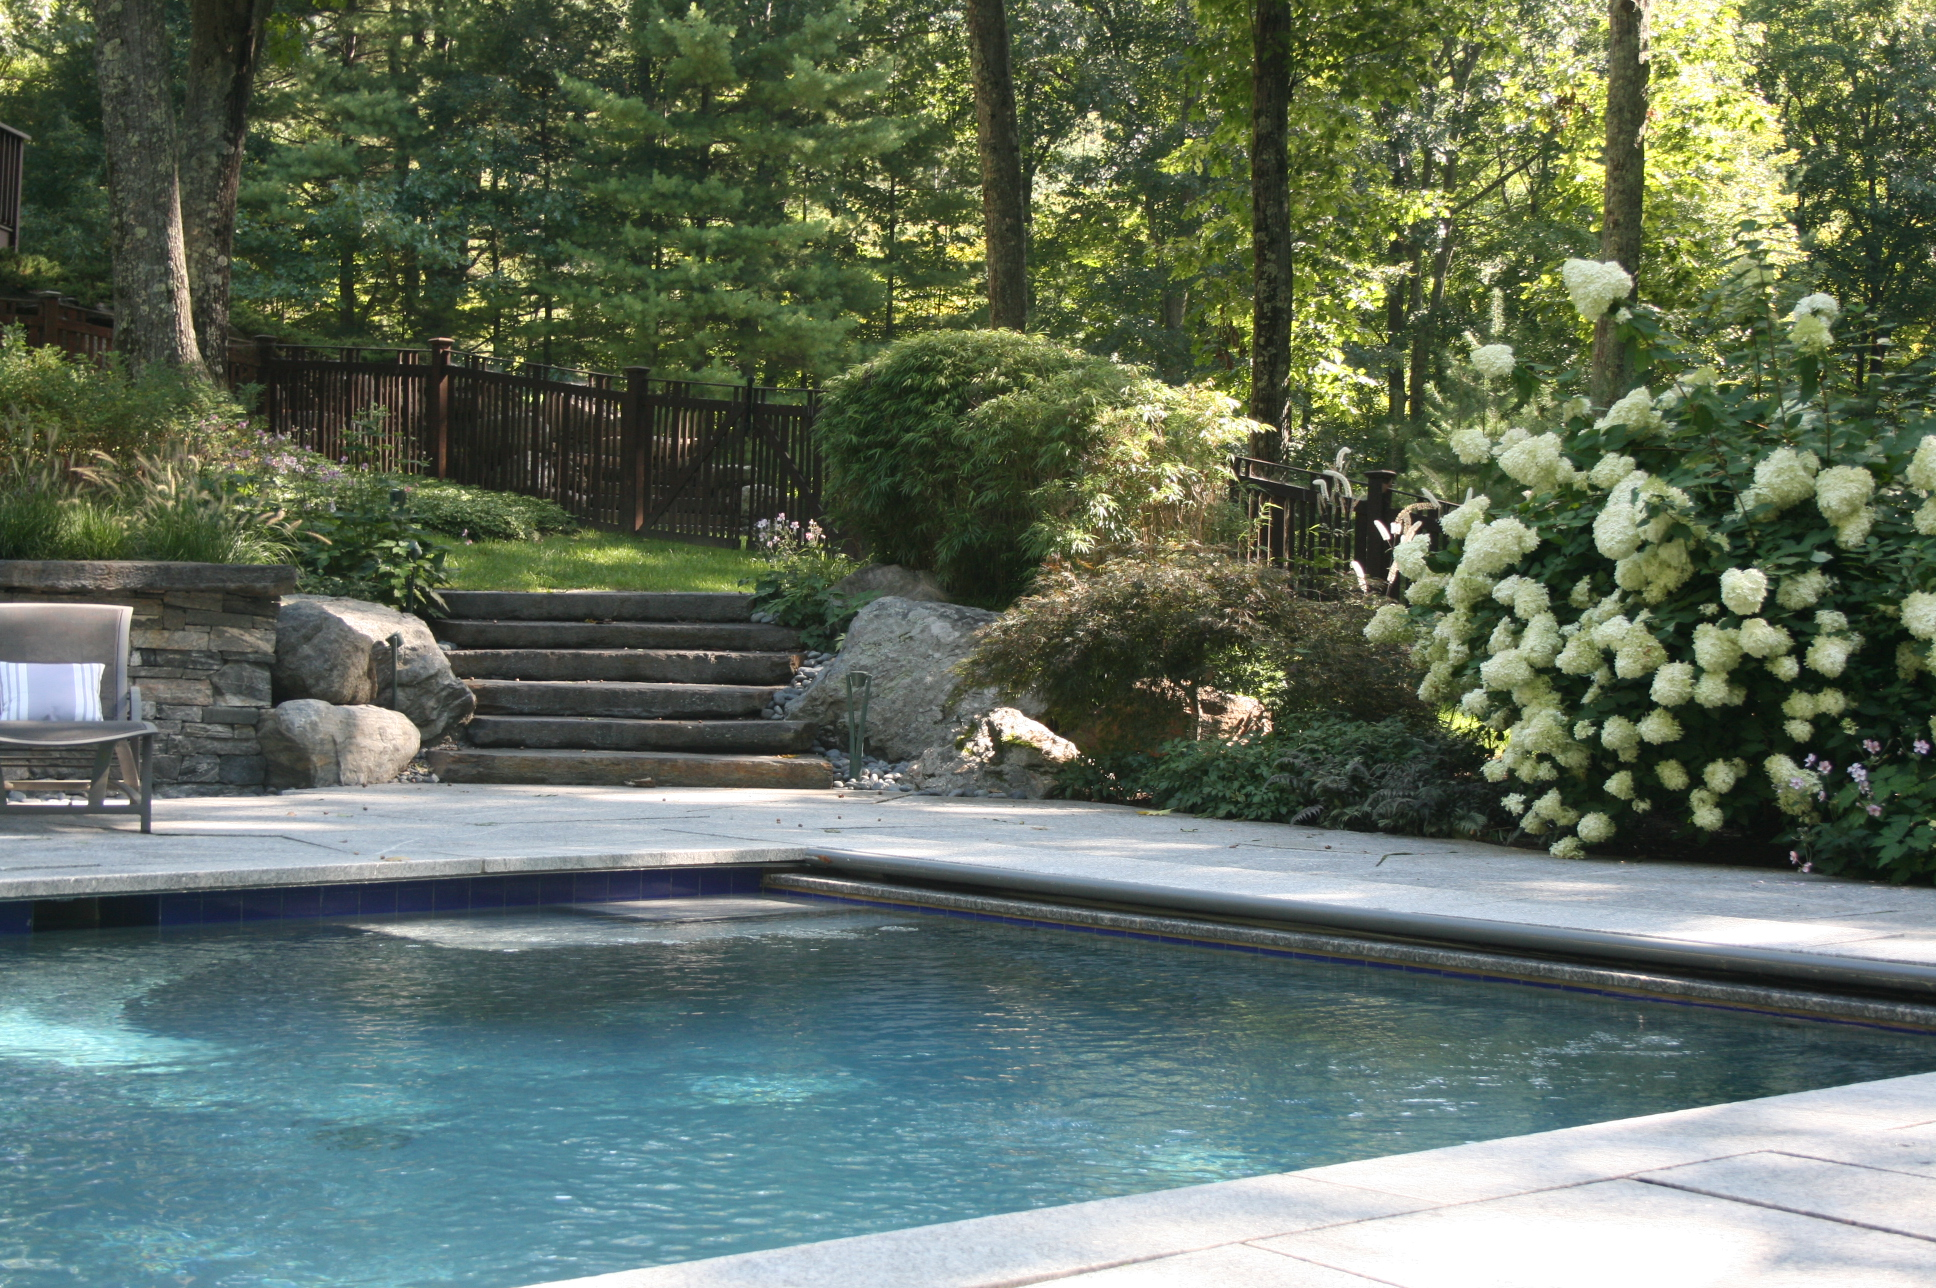 Lower Pool Environment